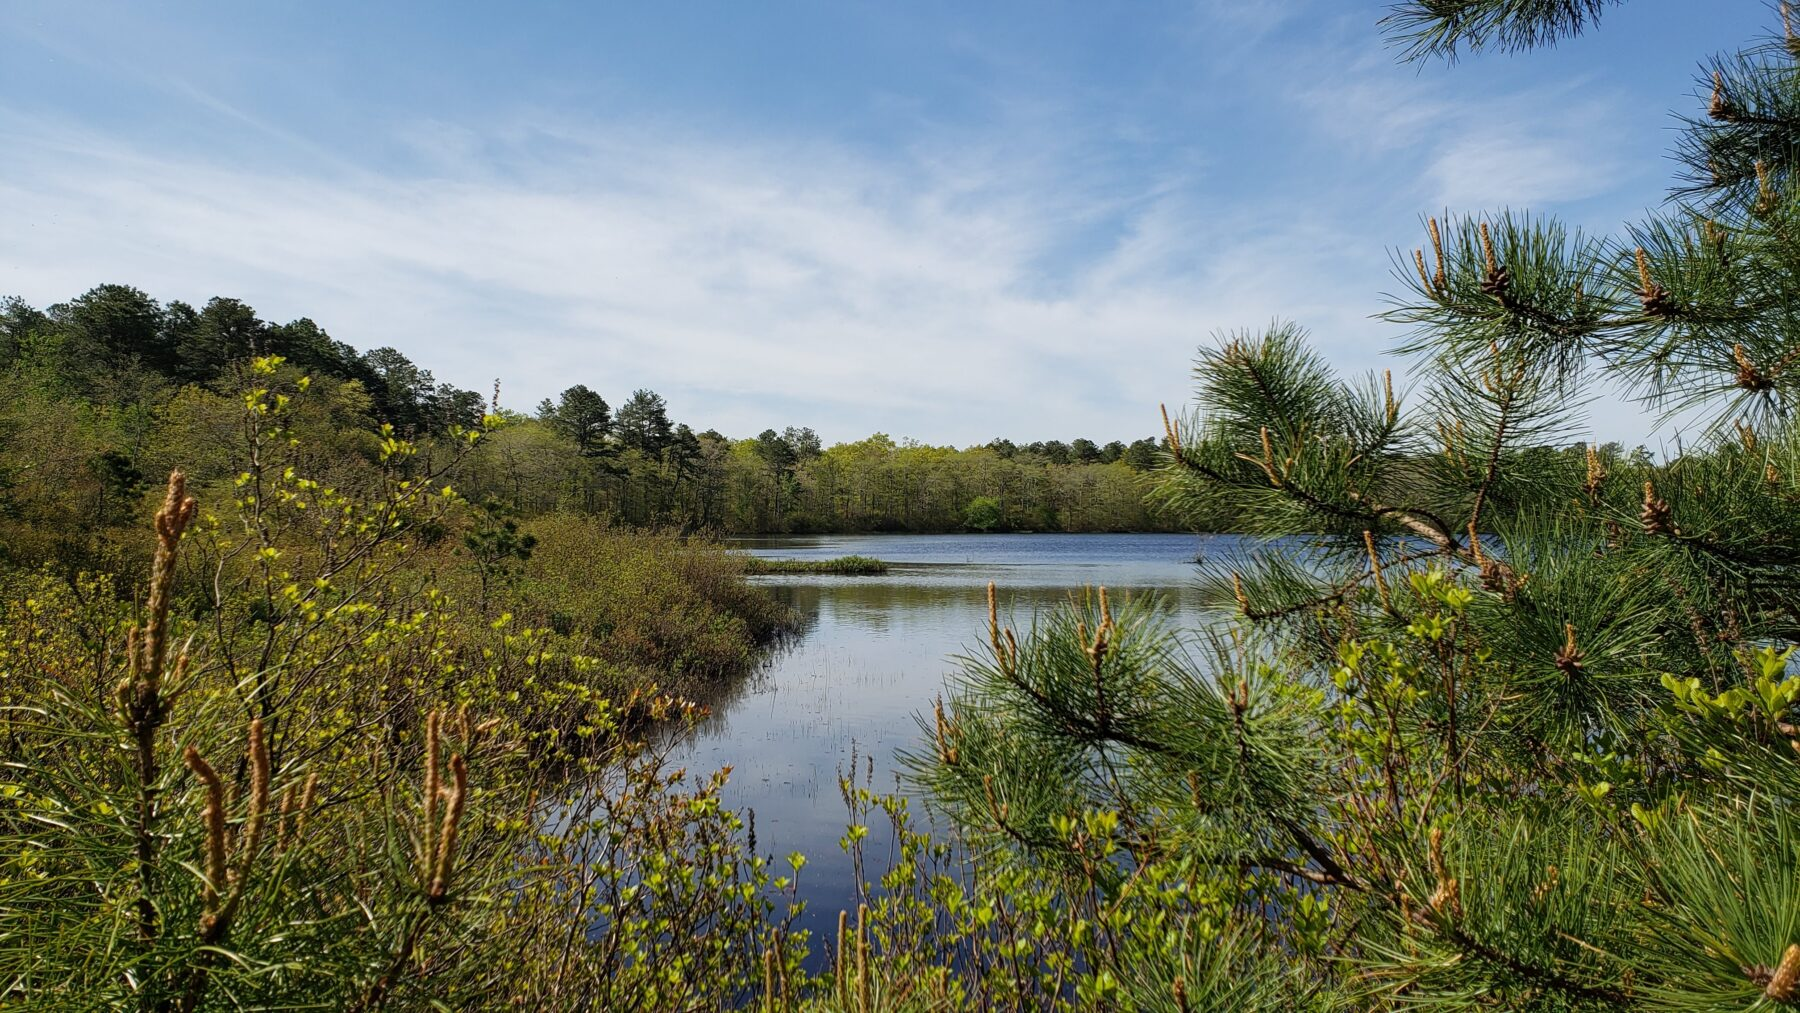 Coastal Plain Pond in the Long Island Pine Barrens